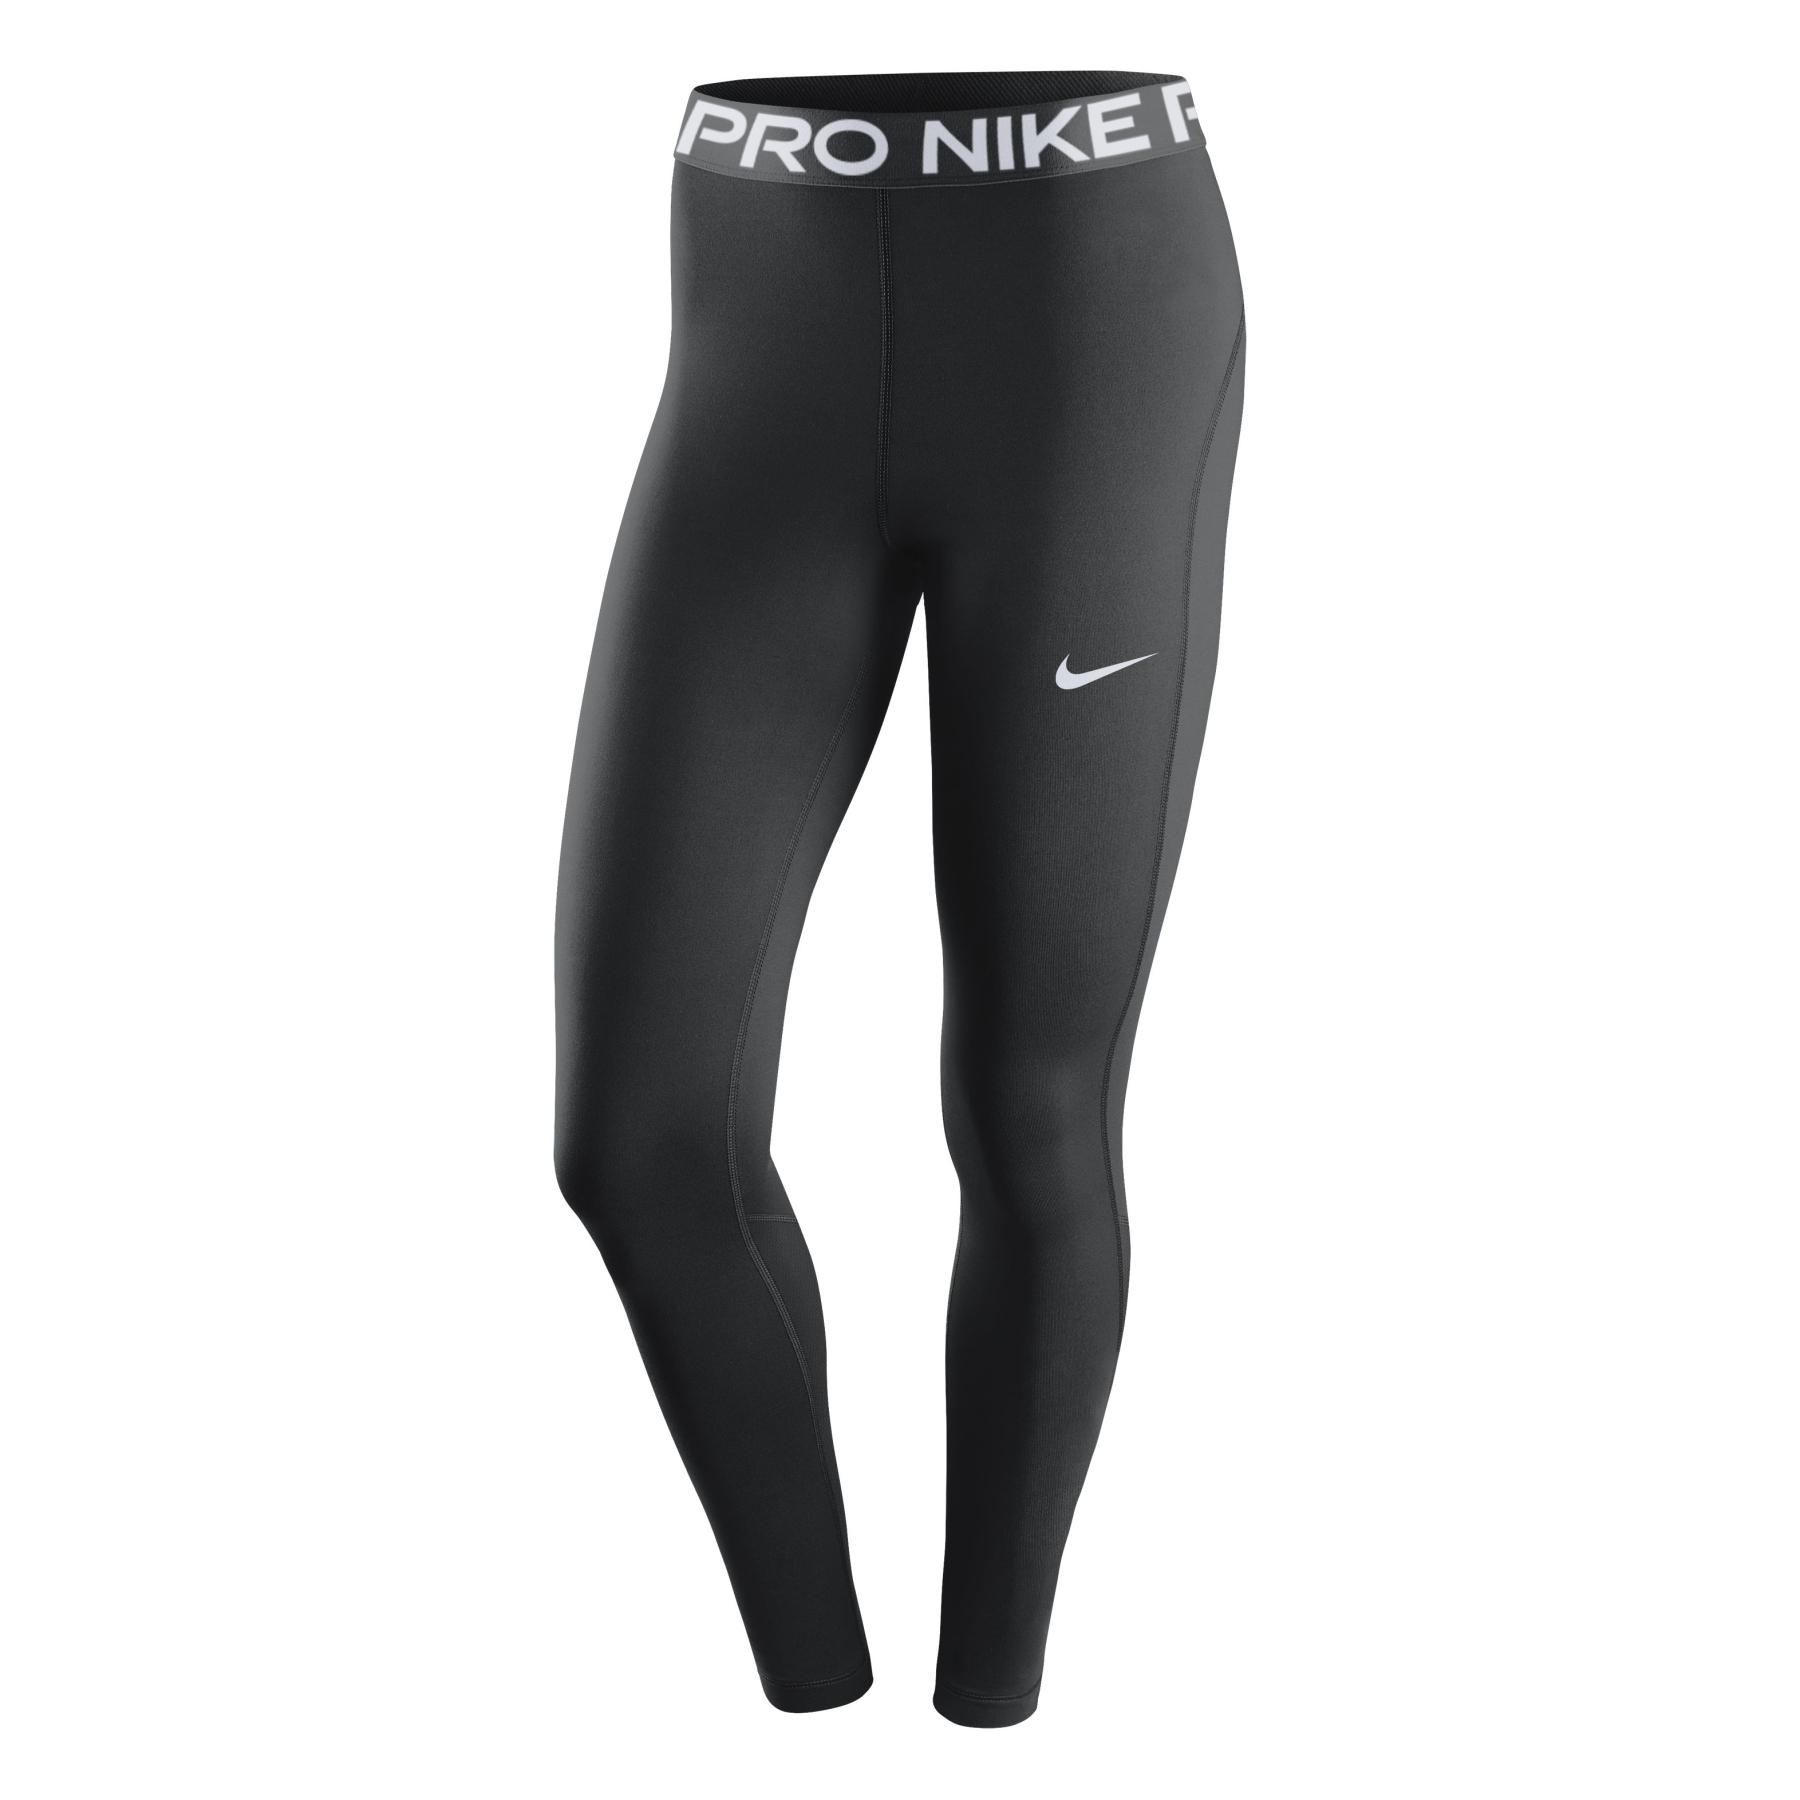 Nike Pro Mid-Rise Mallas Mujer - black/white CZ9779-010